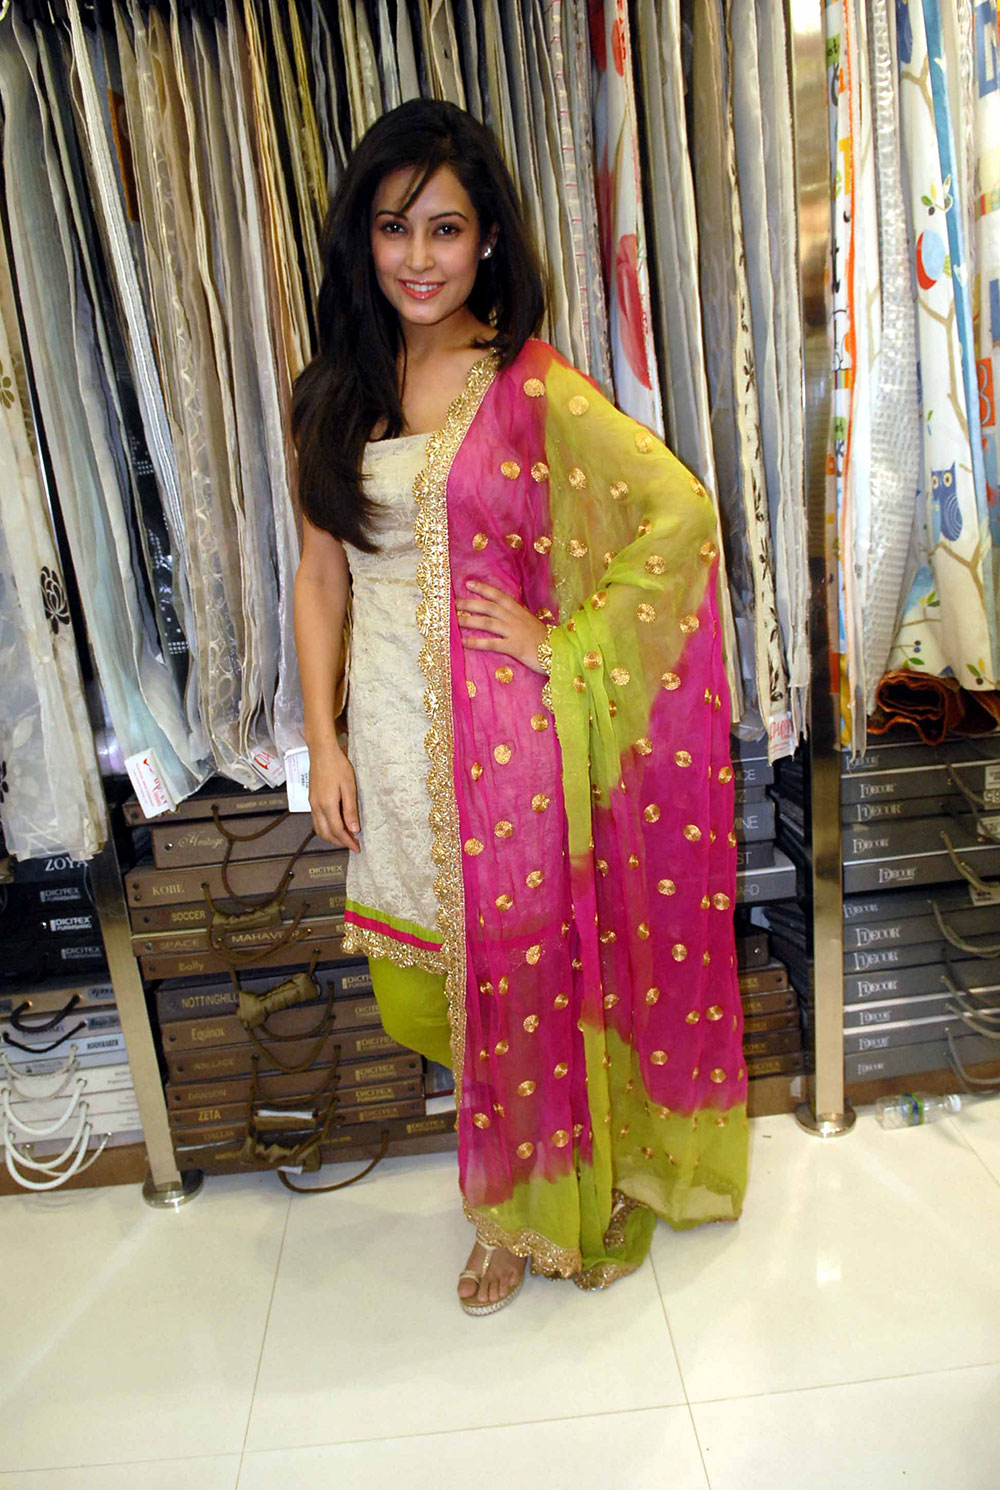 gorgeous hot sexy Disha pandey in etnic salwar kameez at darpan 1st anniversary